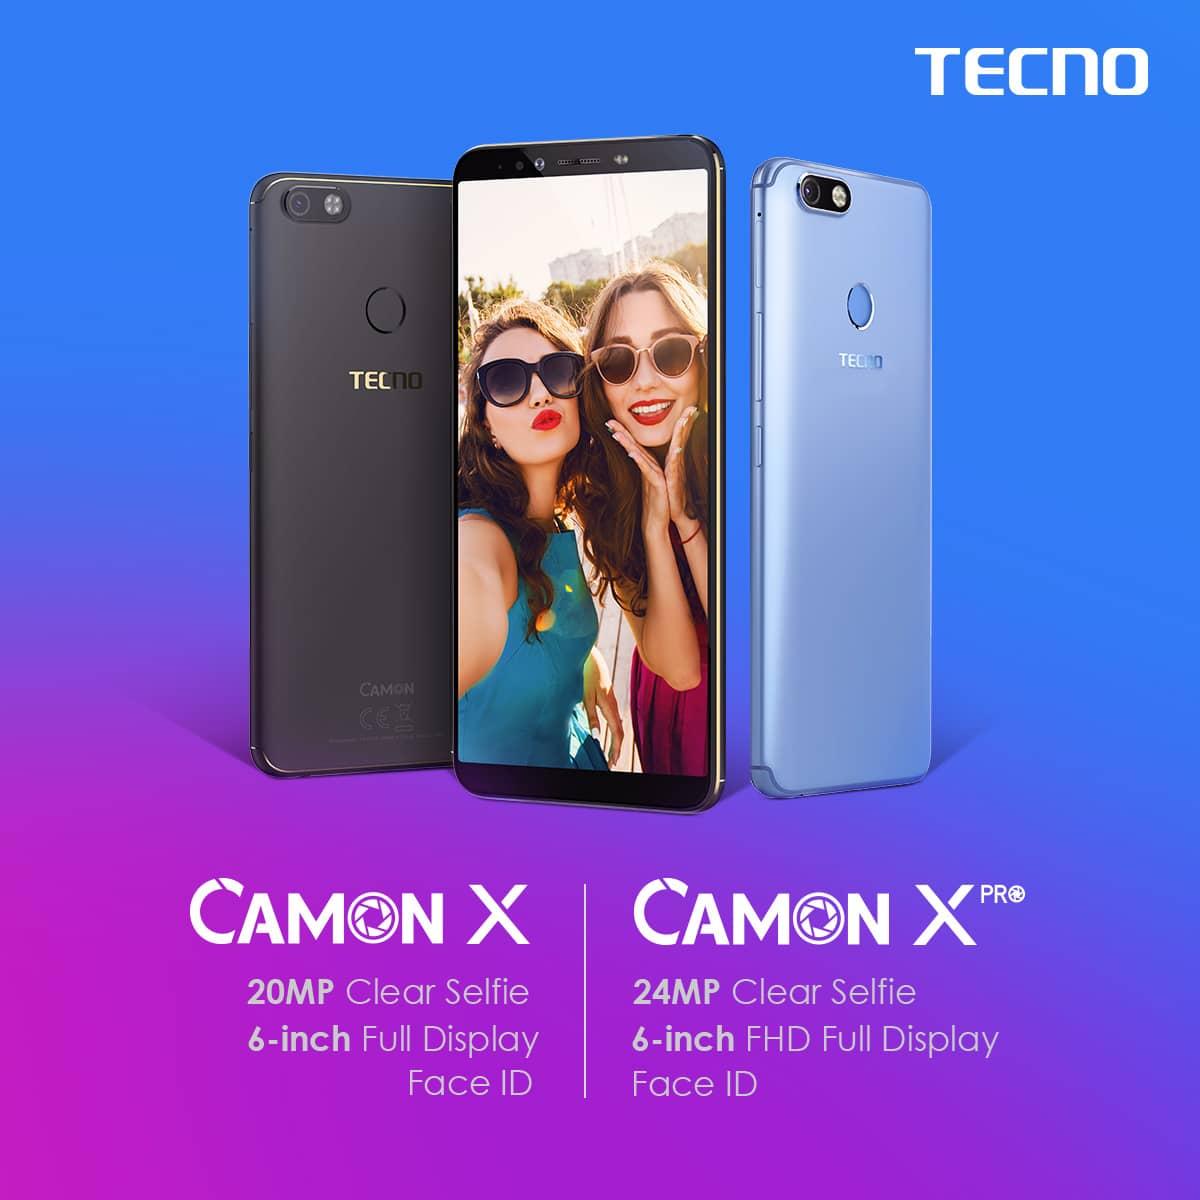 tecno camon x specifications - tecno pouvoir 2 vs tecno camon x